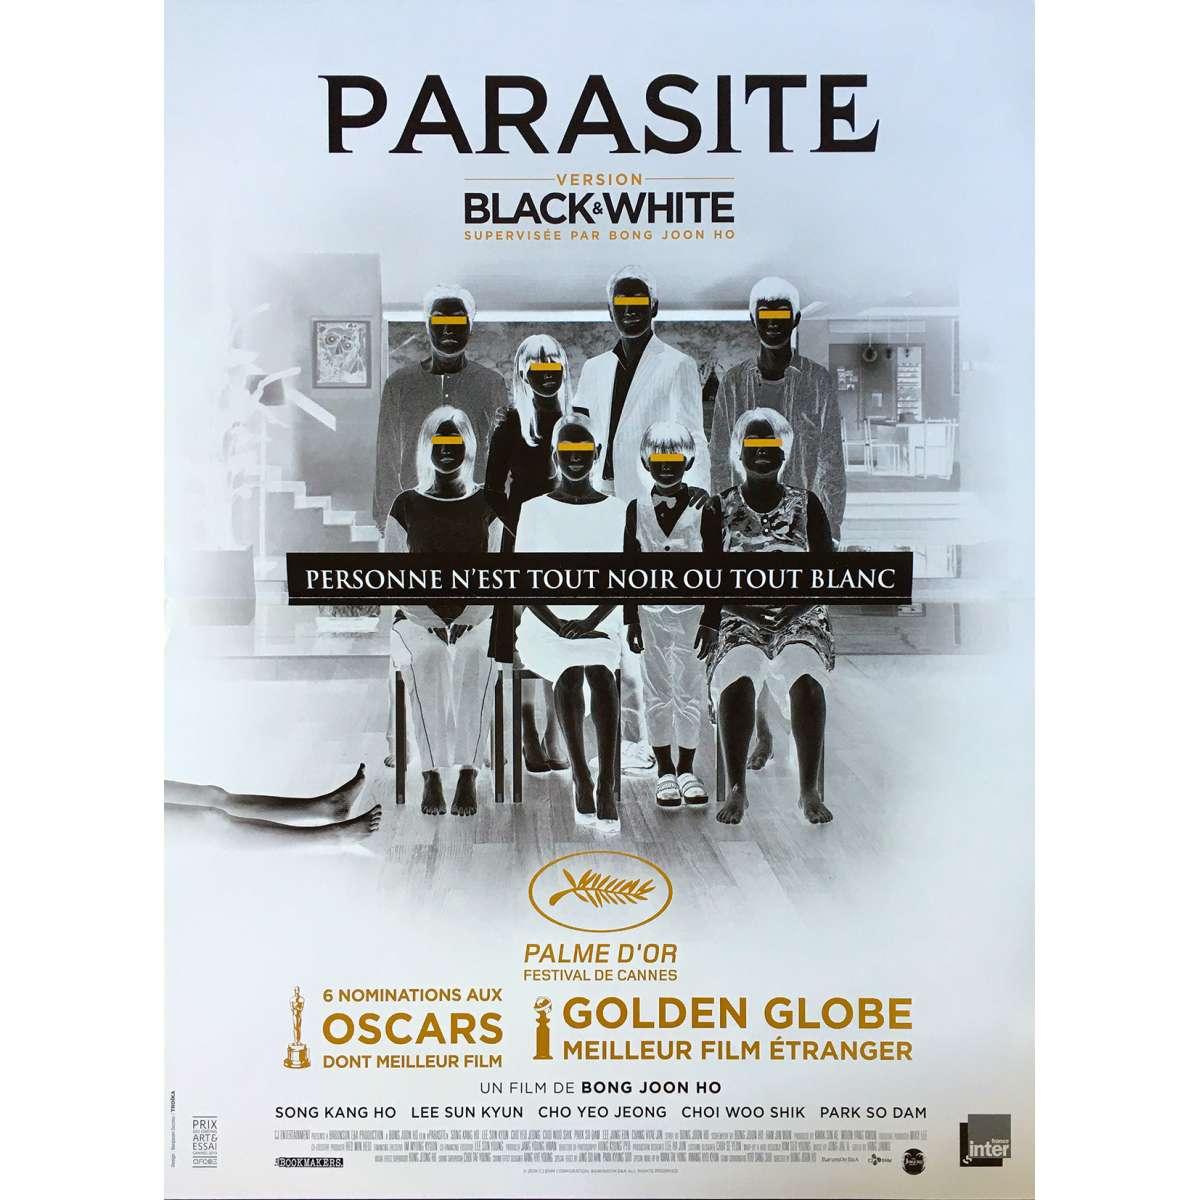 parasite black and white original movie poster 15x21 in 2020 bong joon ho kang ho song